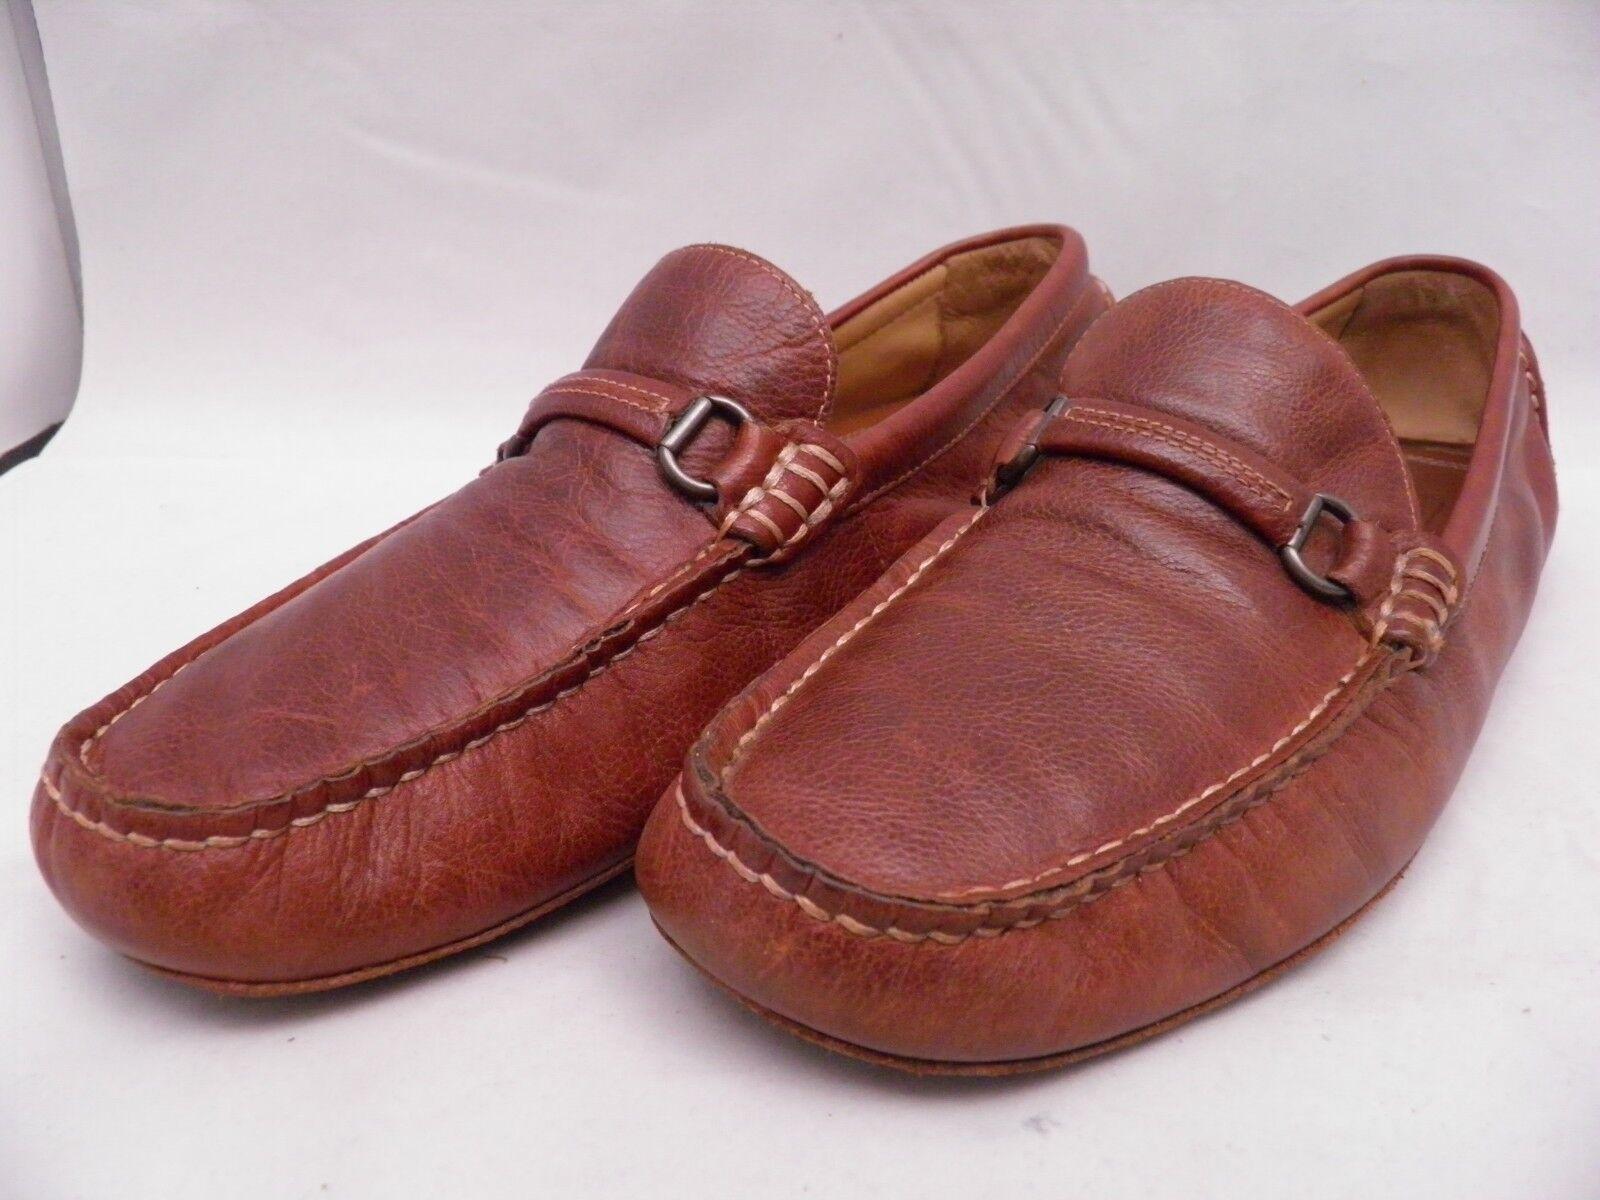 Johnston & Murphy mens brown slip-on driving shoe size 11M